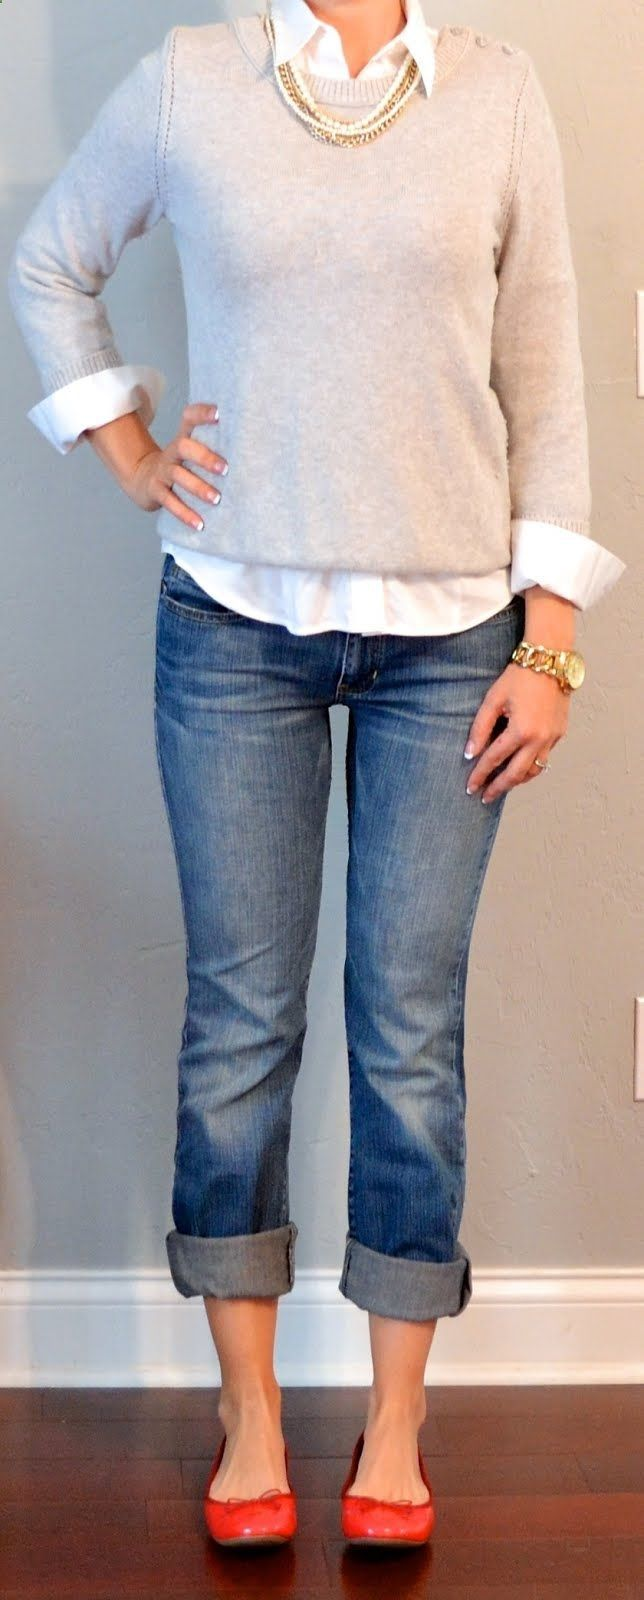 white button down shirt, grey sweater, boyfriend jeans, red ballet flats